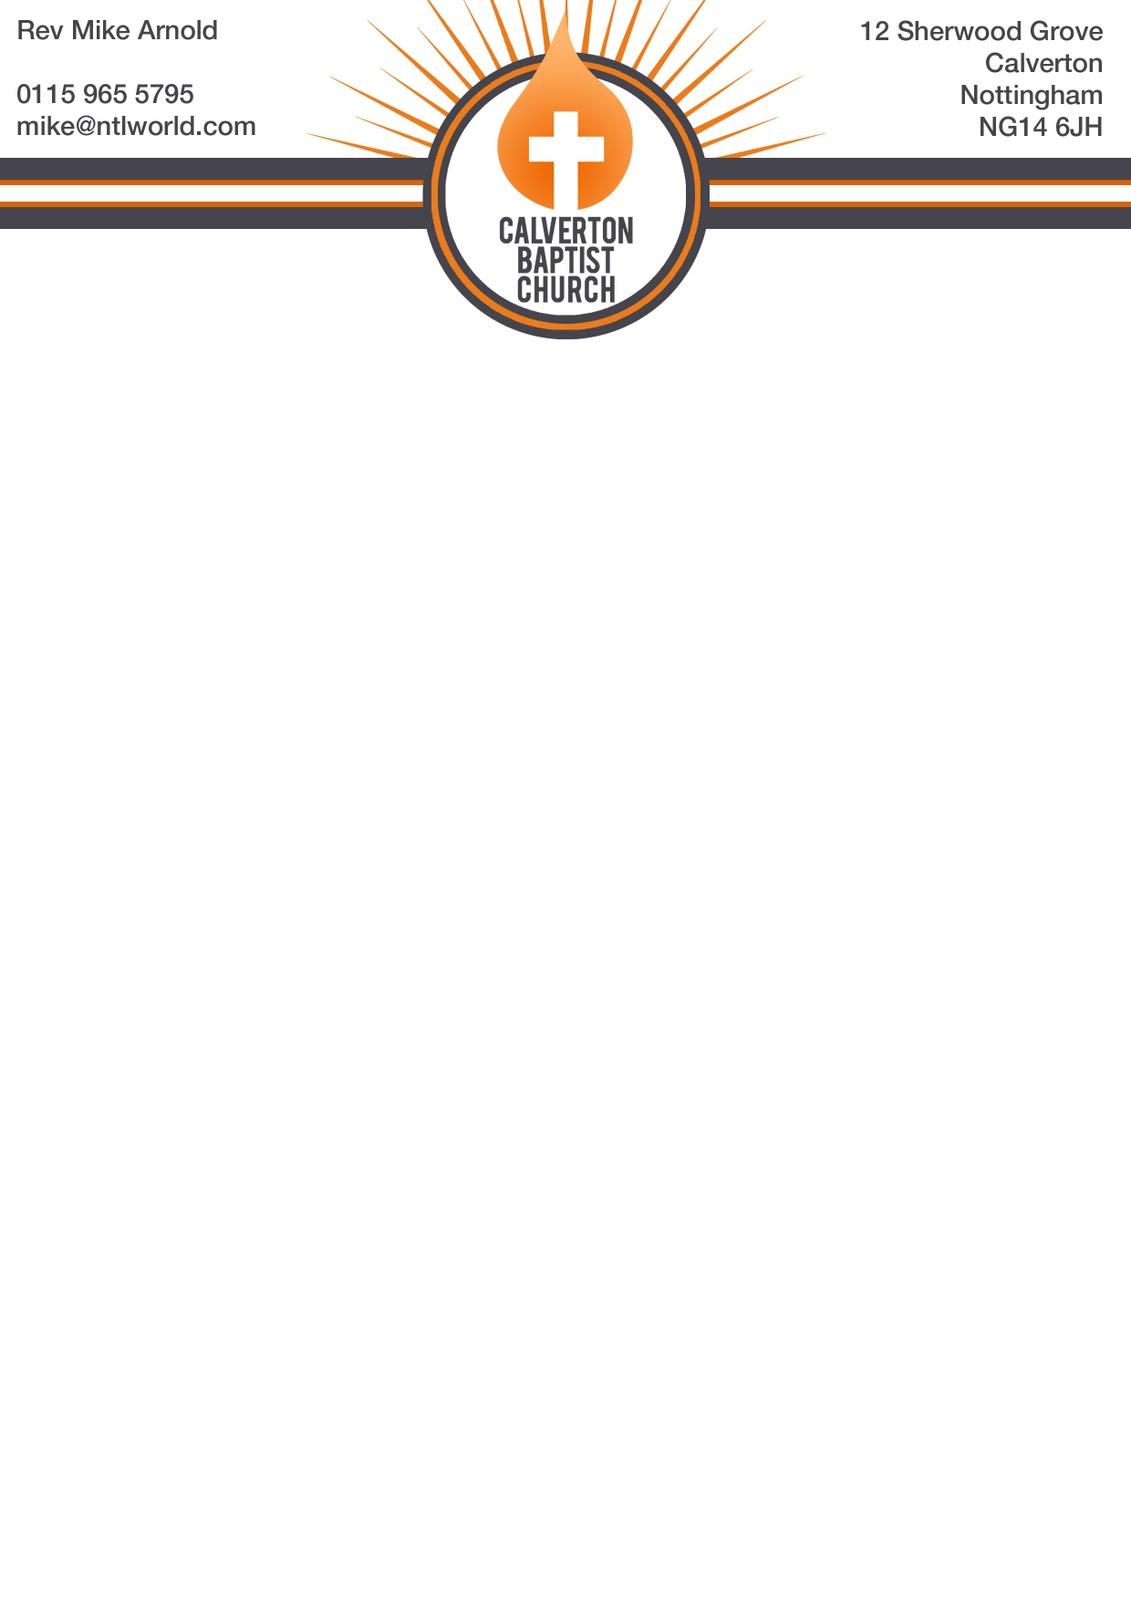 nate welfare fmp design practice church letterheads